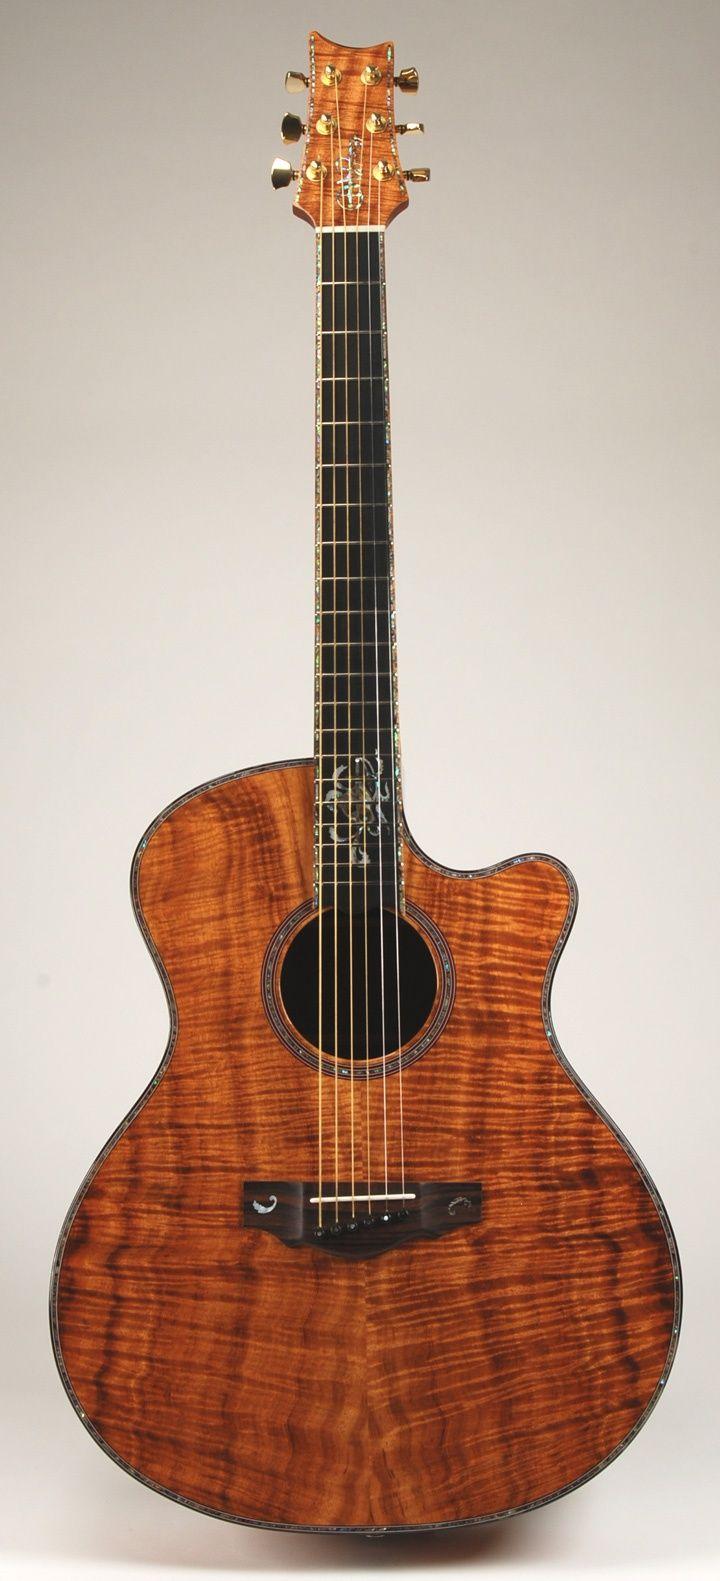 Dovetail template printable guitar - Warrior Custom Shop Acoustic